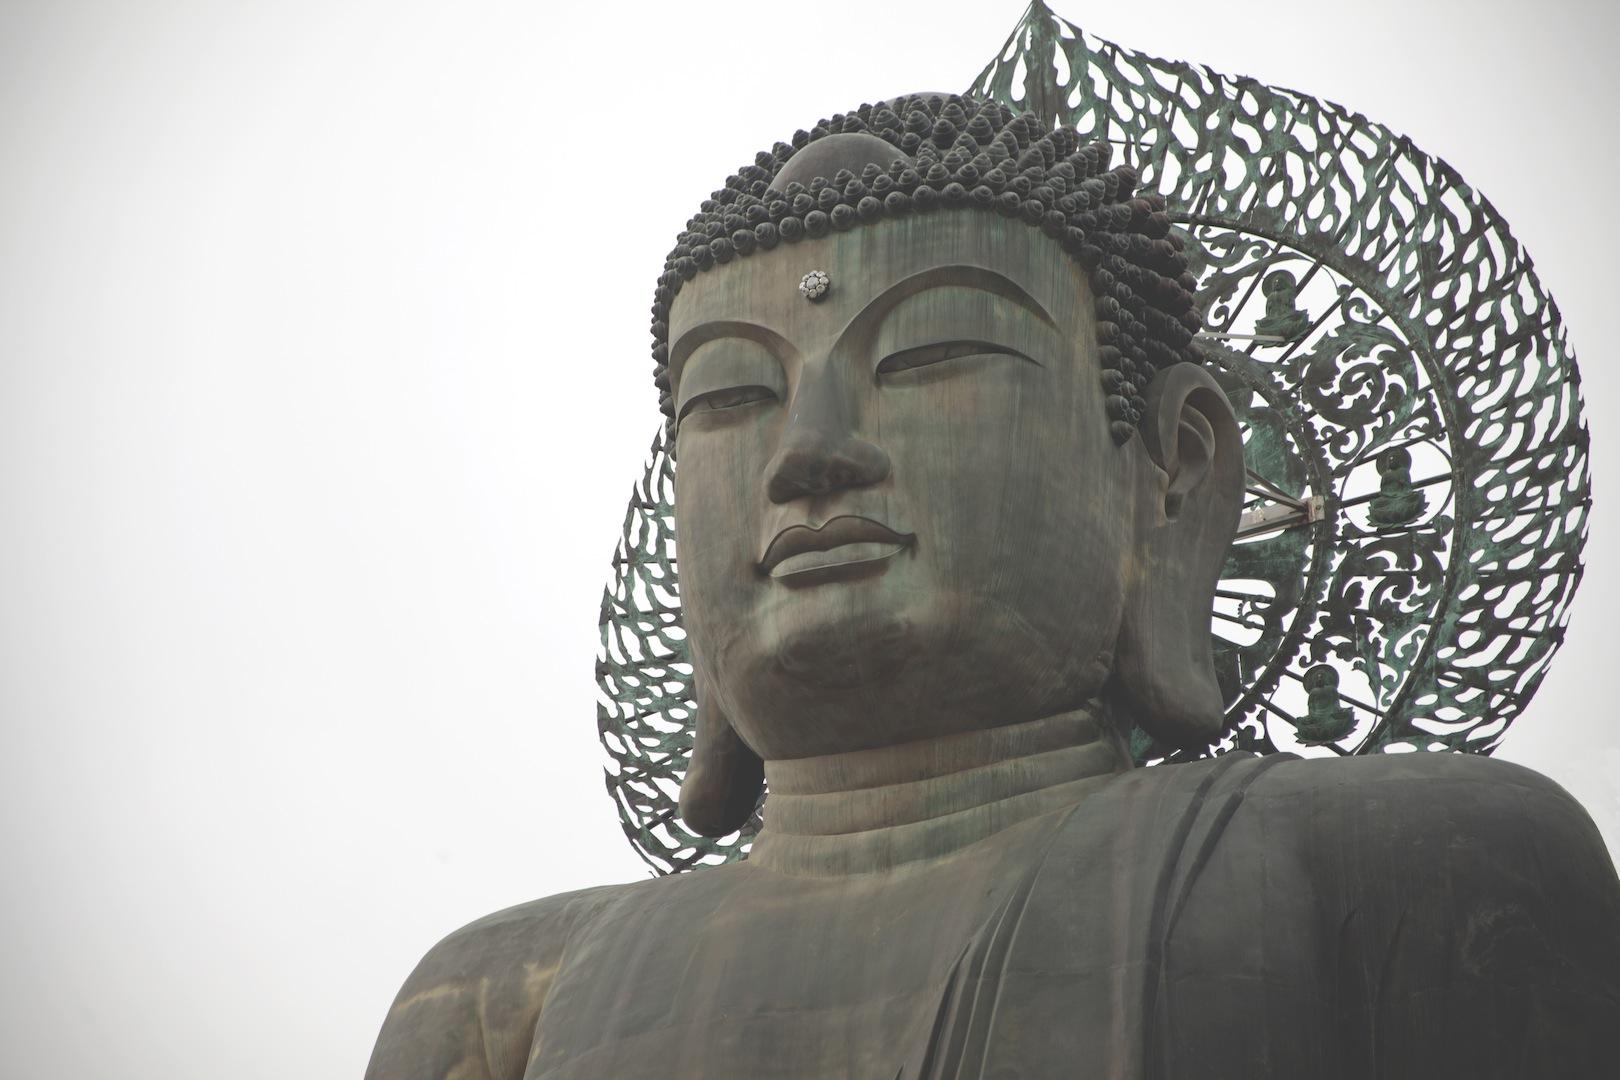 Buddah's Birthday